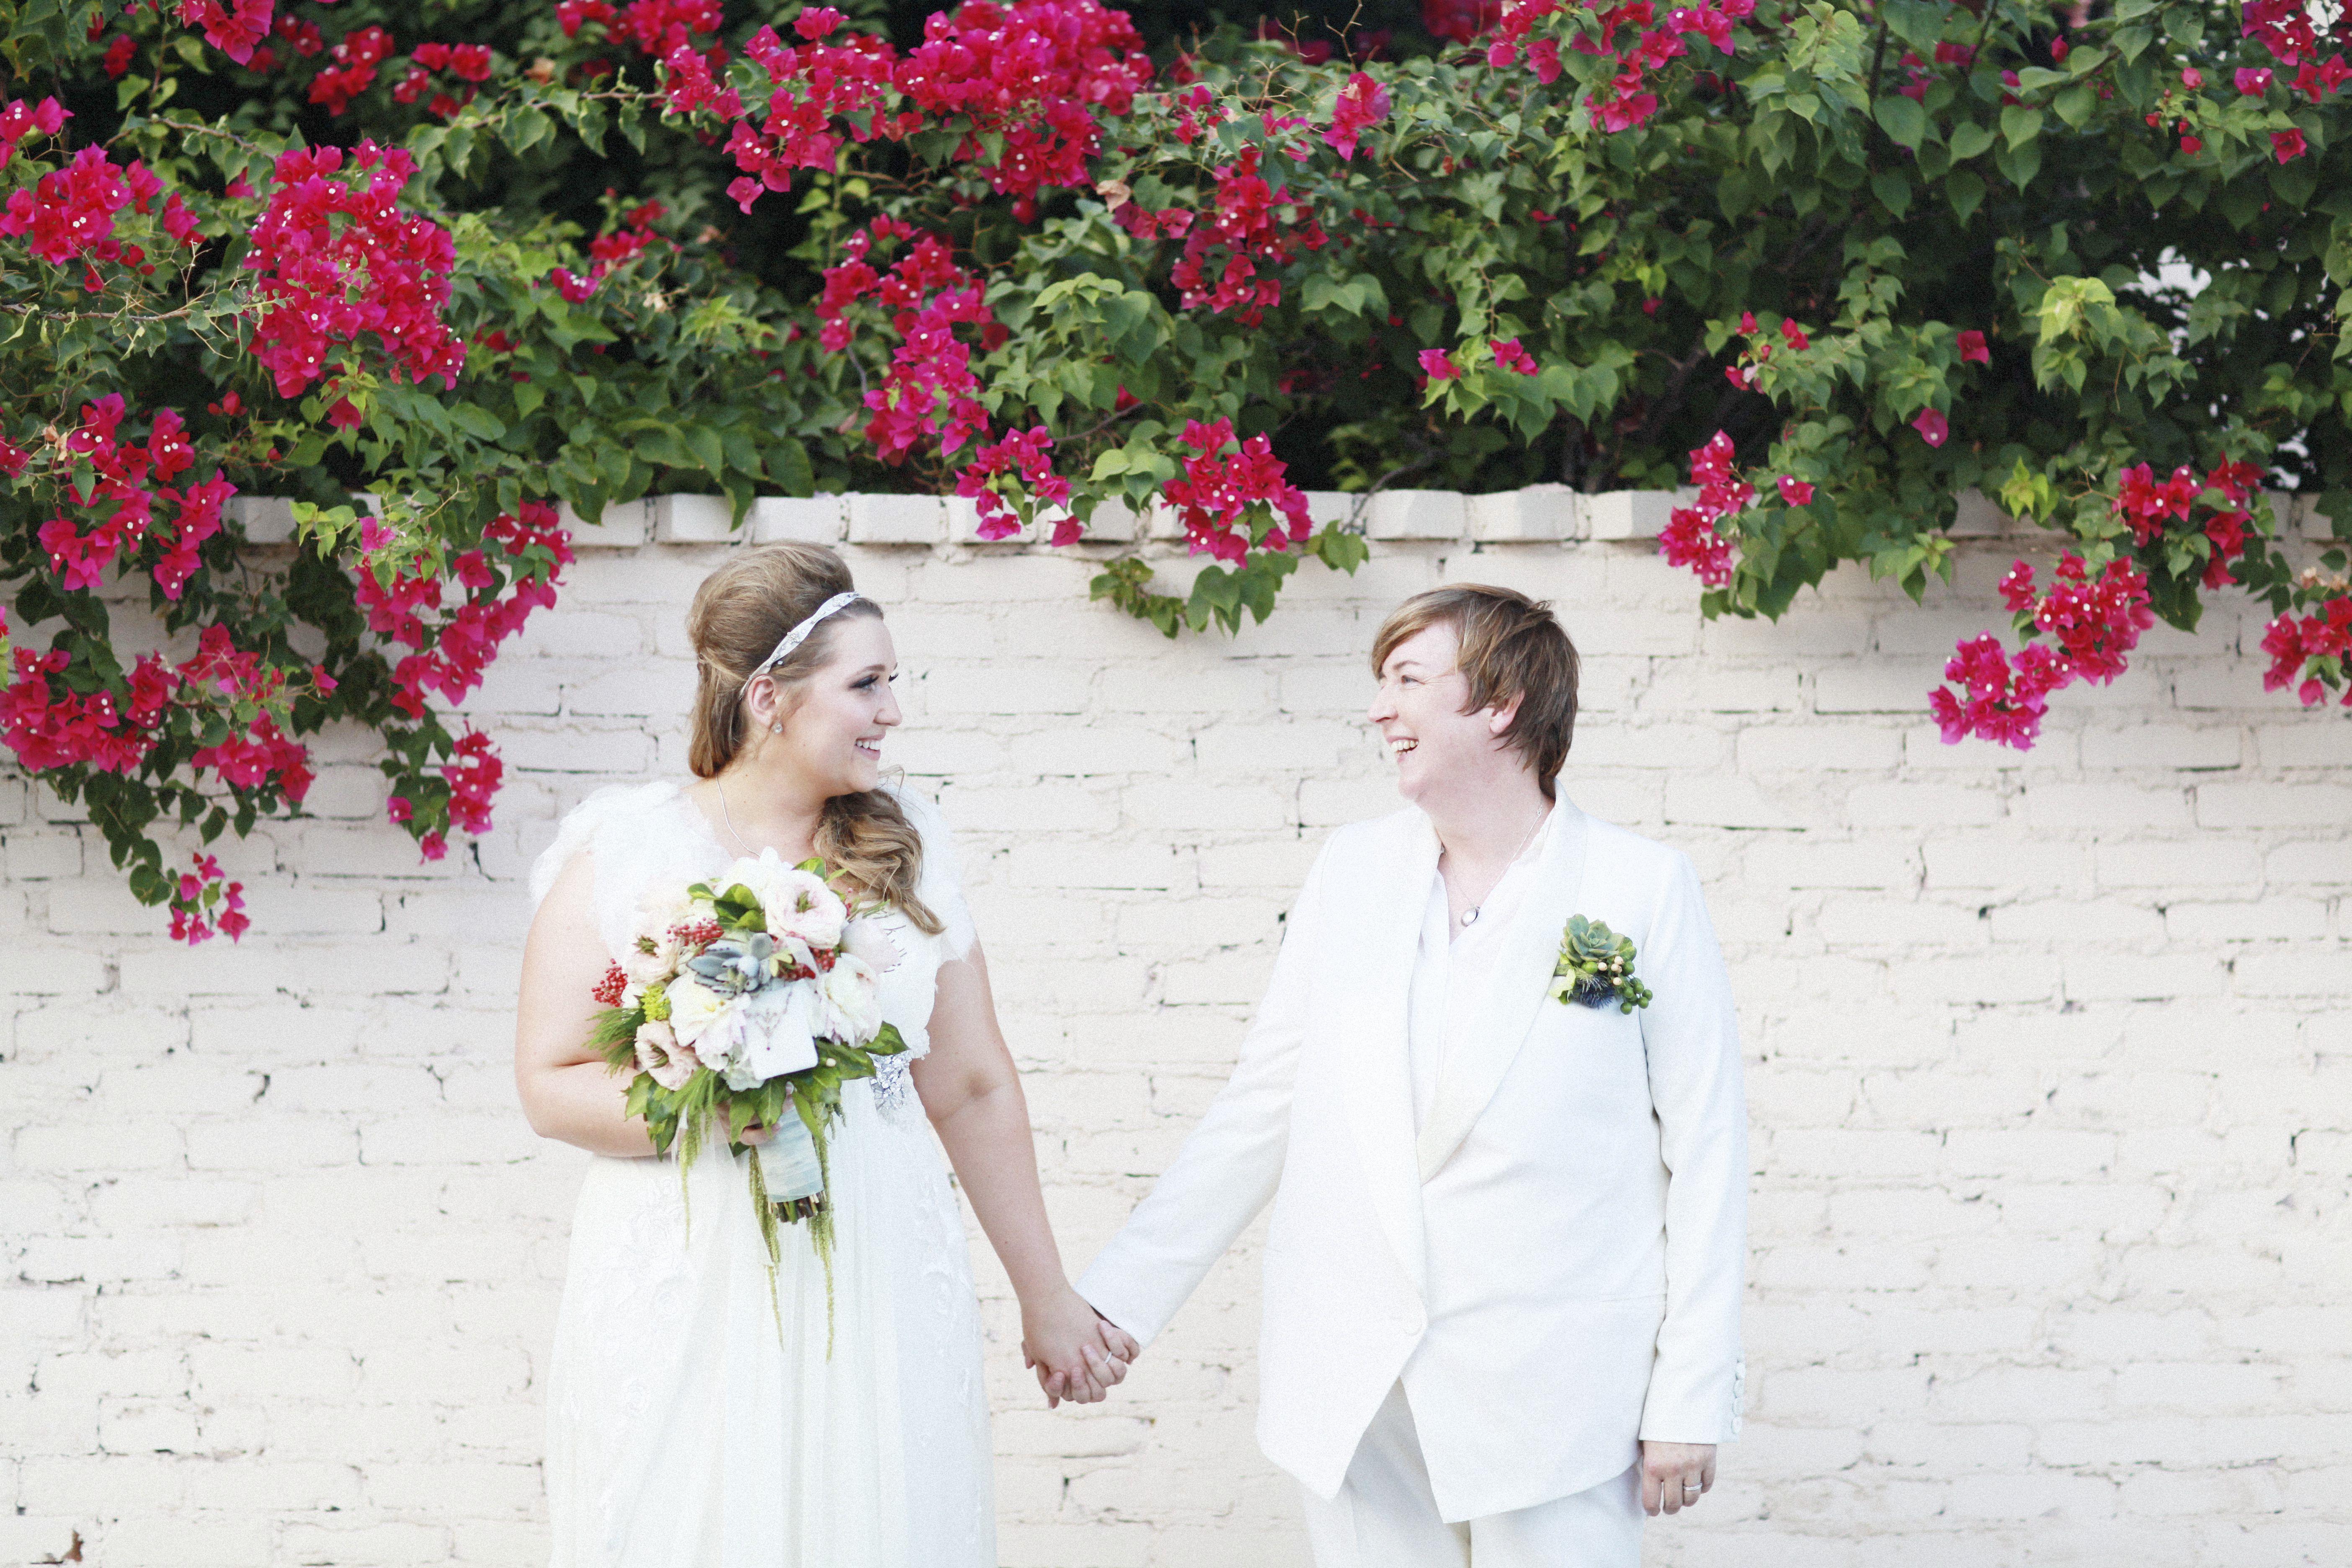 Gay marriage legal in california